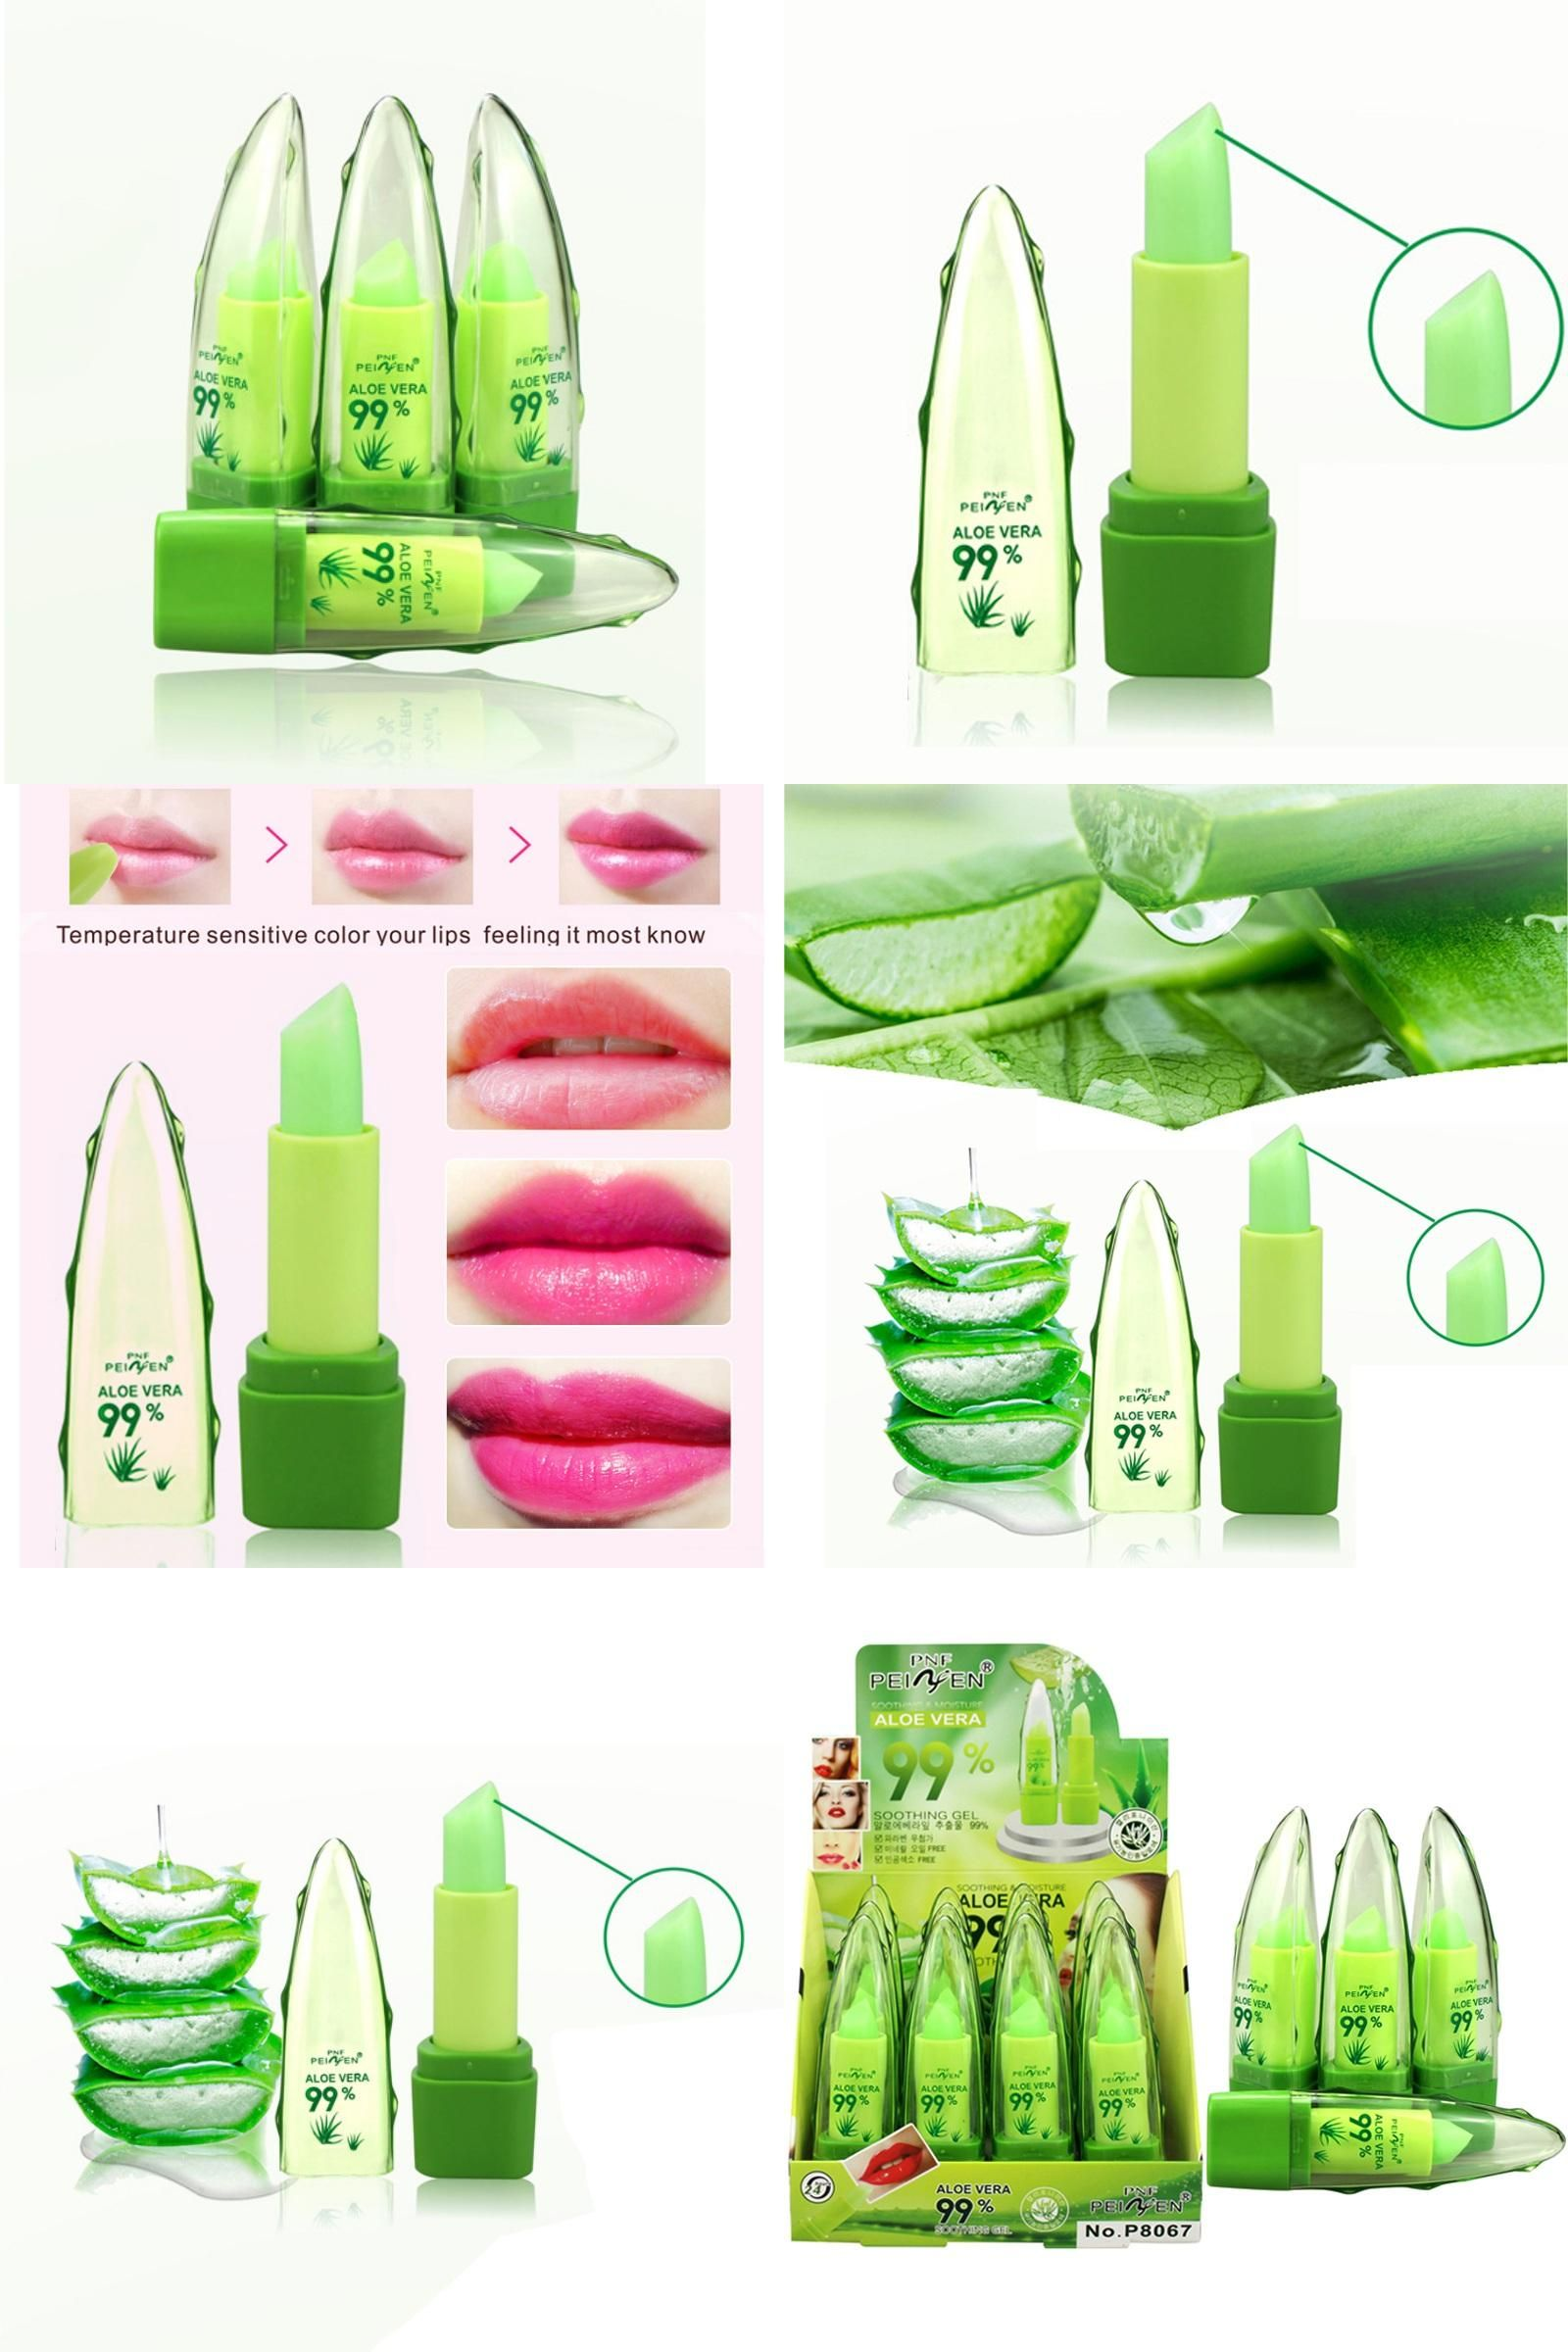 [Visit to Buy] 99 Aloe Vera Essence Lips Long Lasting